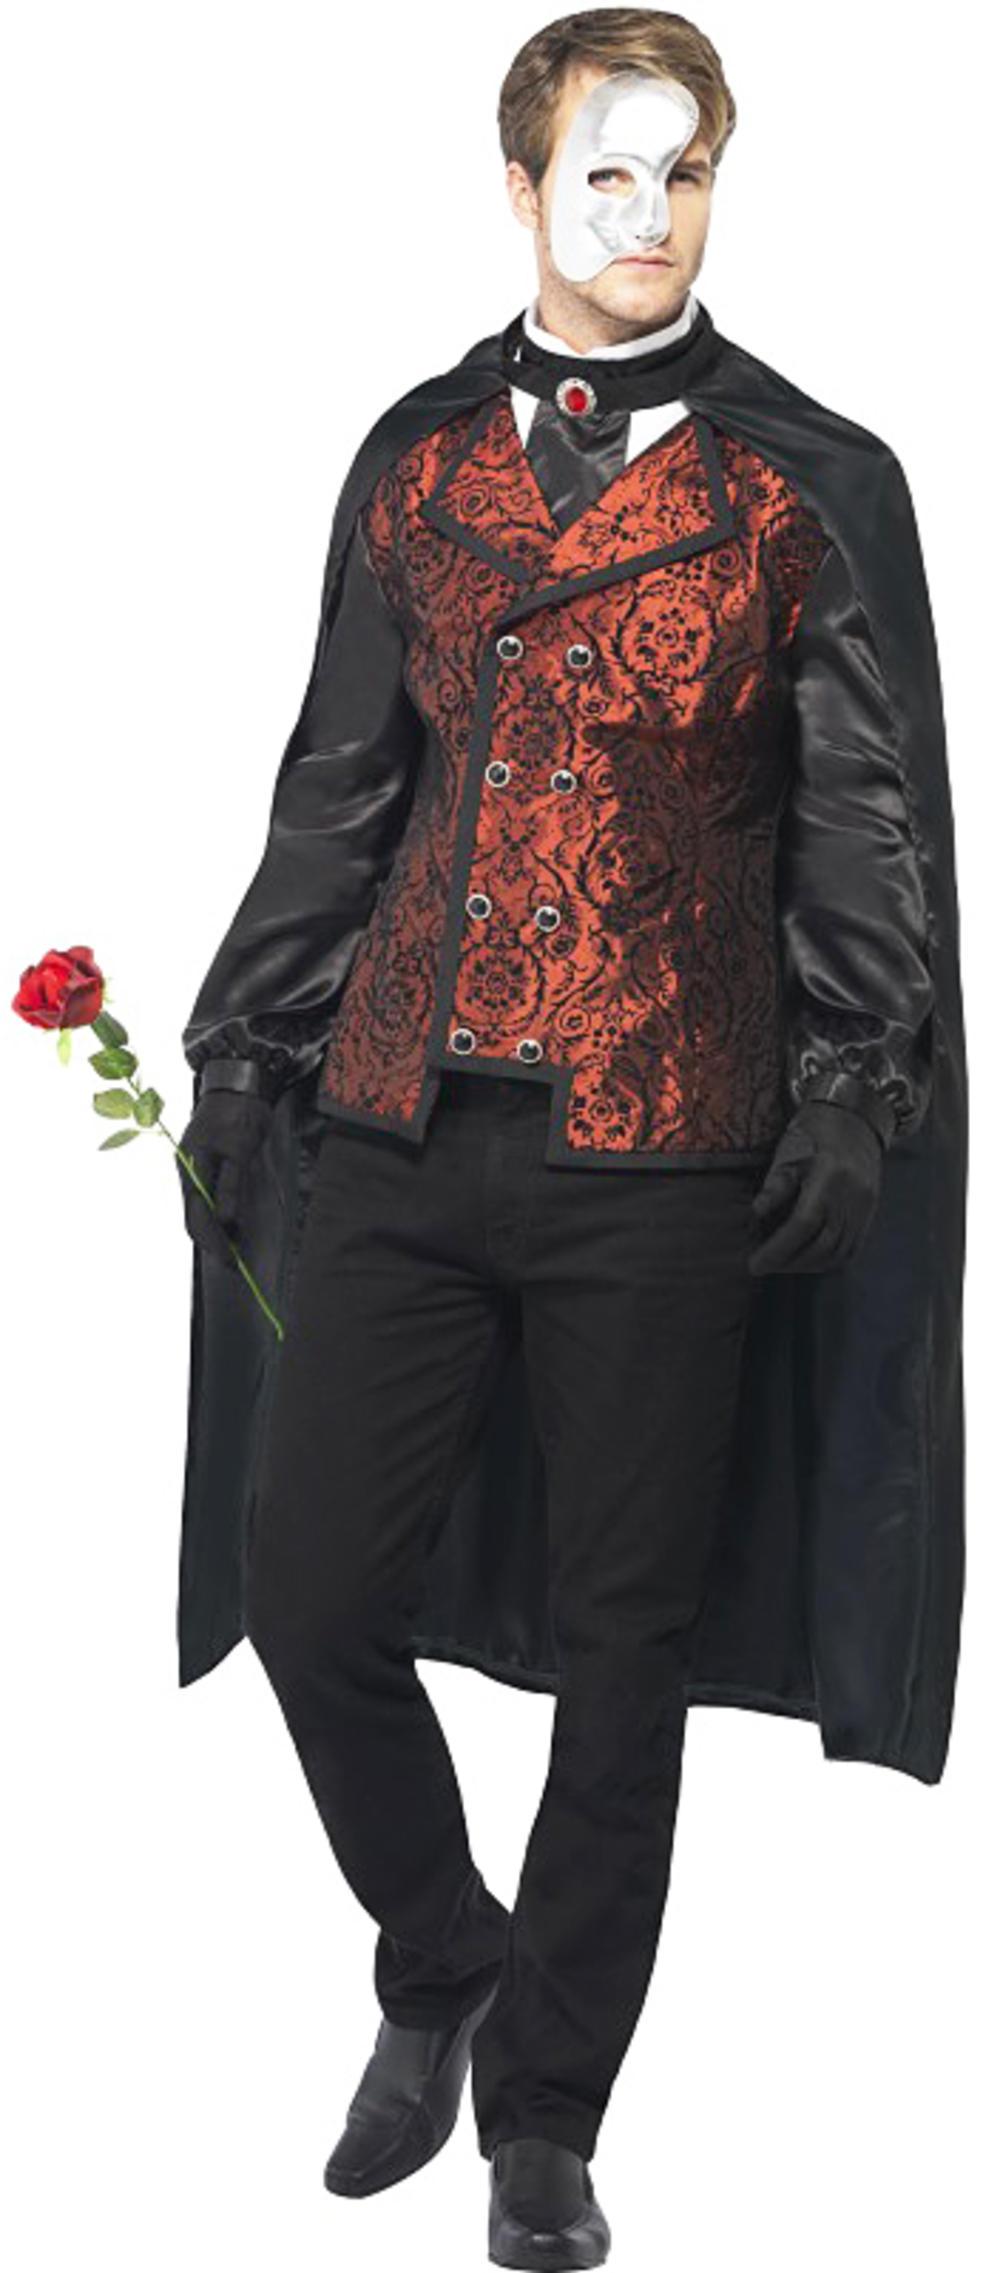 Dark Opera Masquerade Mens Fancy Dress Halloween Adult Horror Costume + Mask New